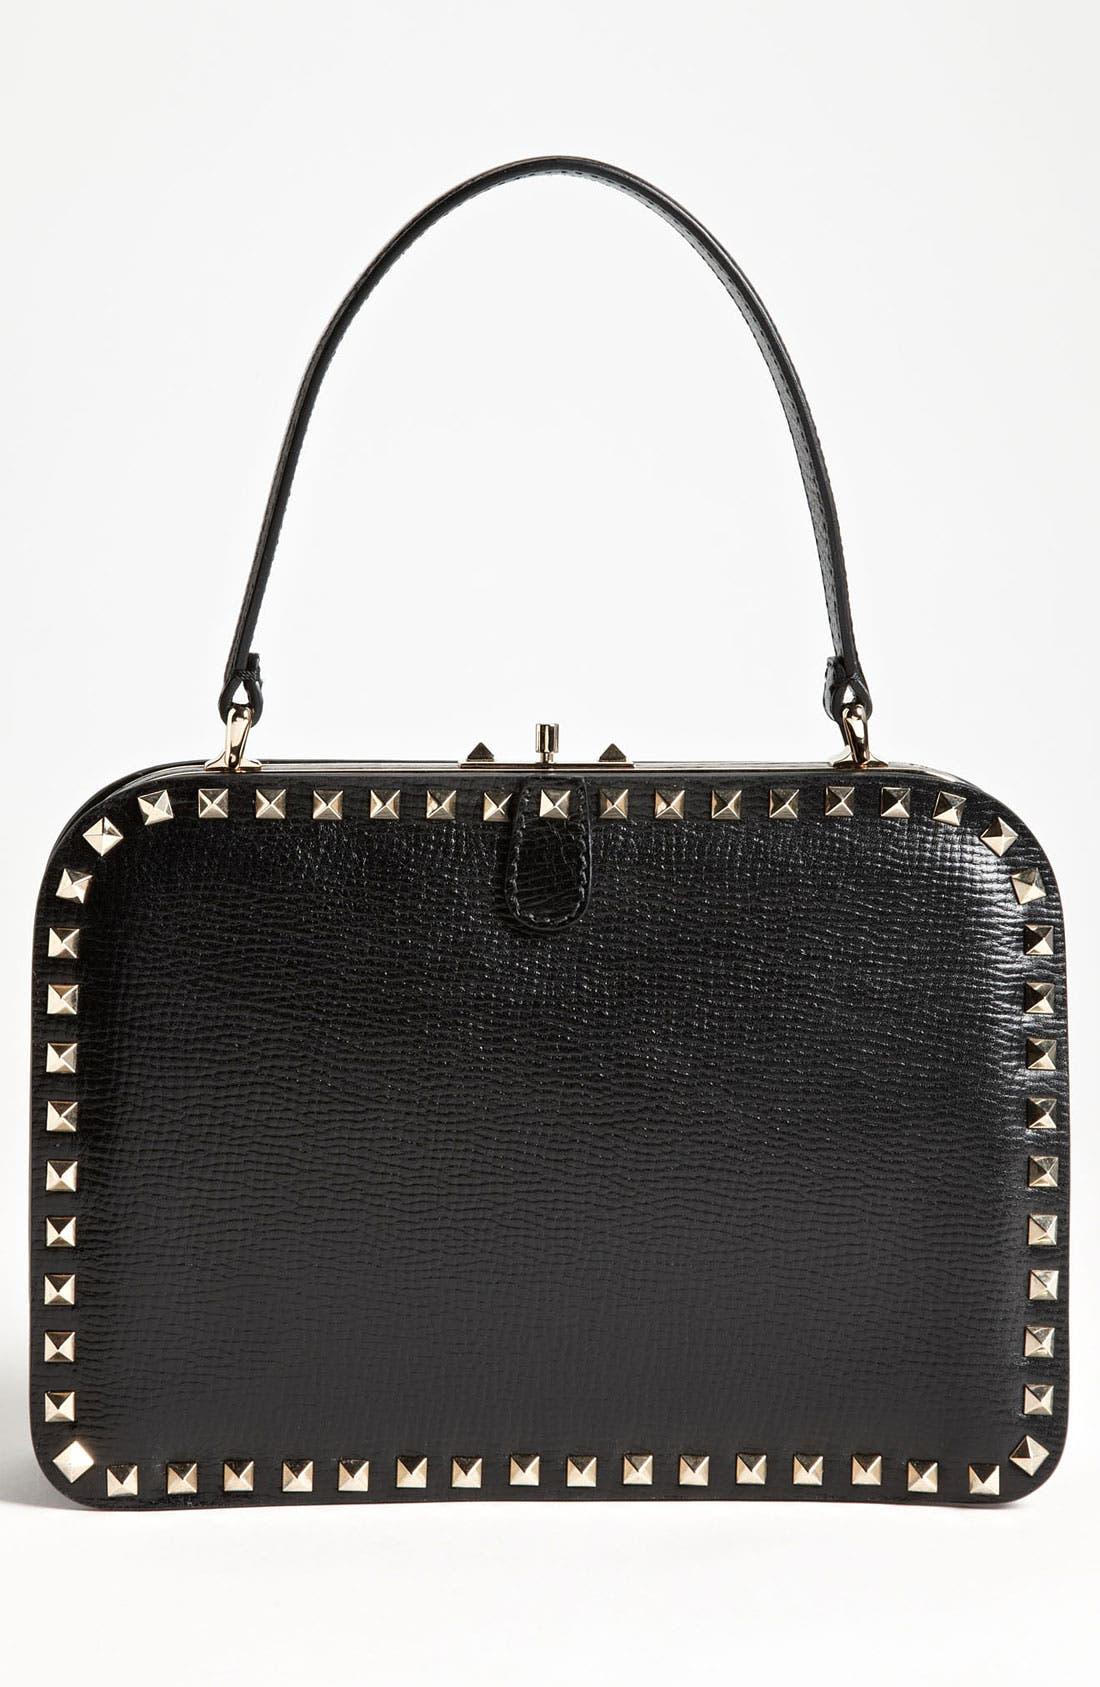 Alternate Image 1 Selected - Valentino 'Rockstud - Mini' Frame Bag